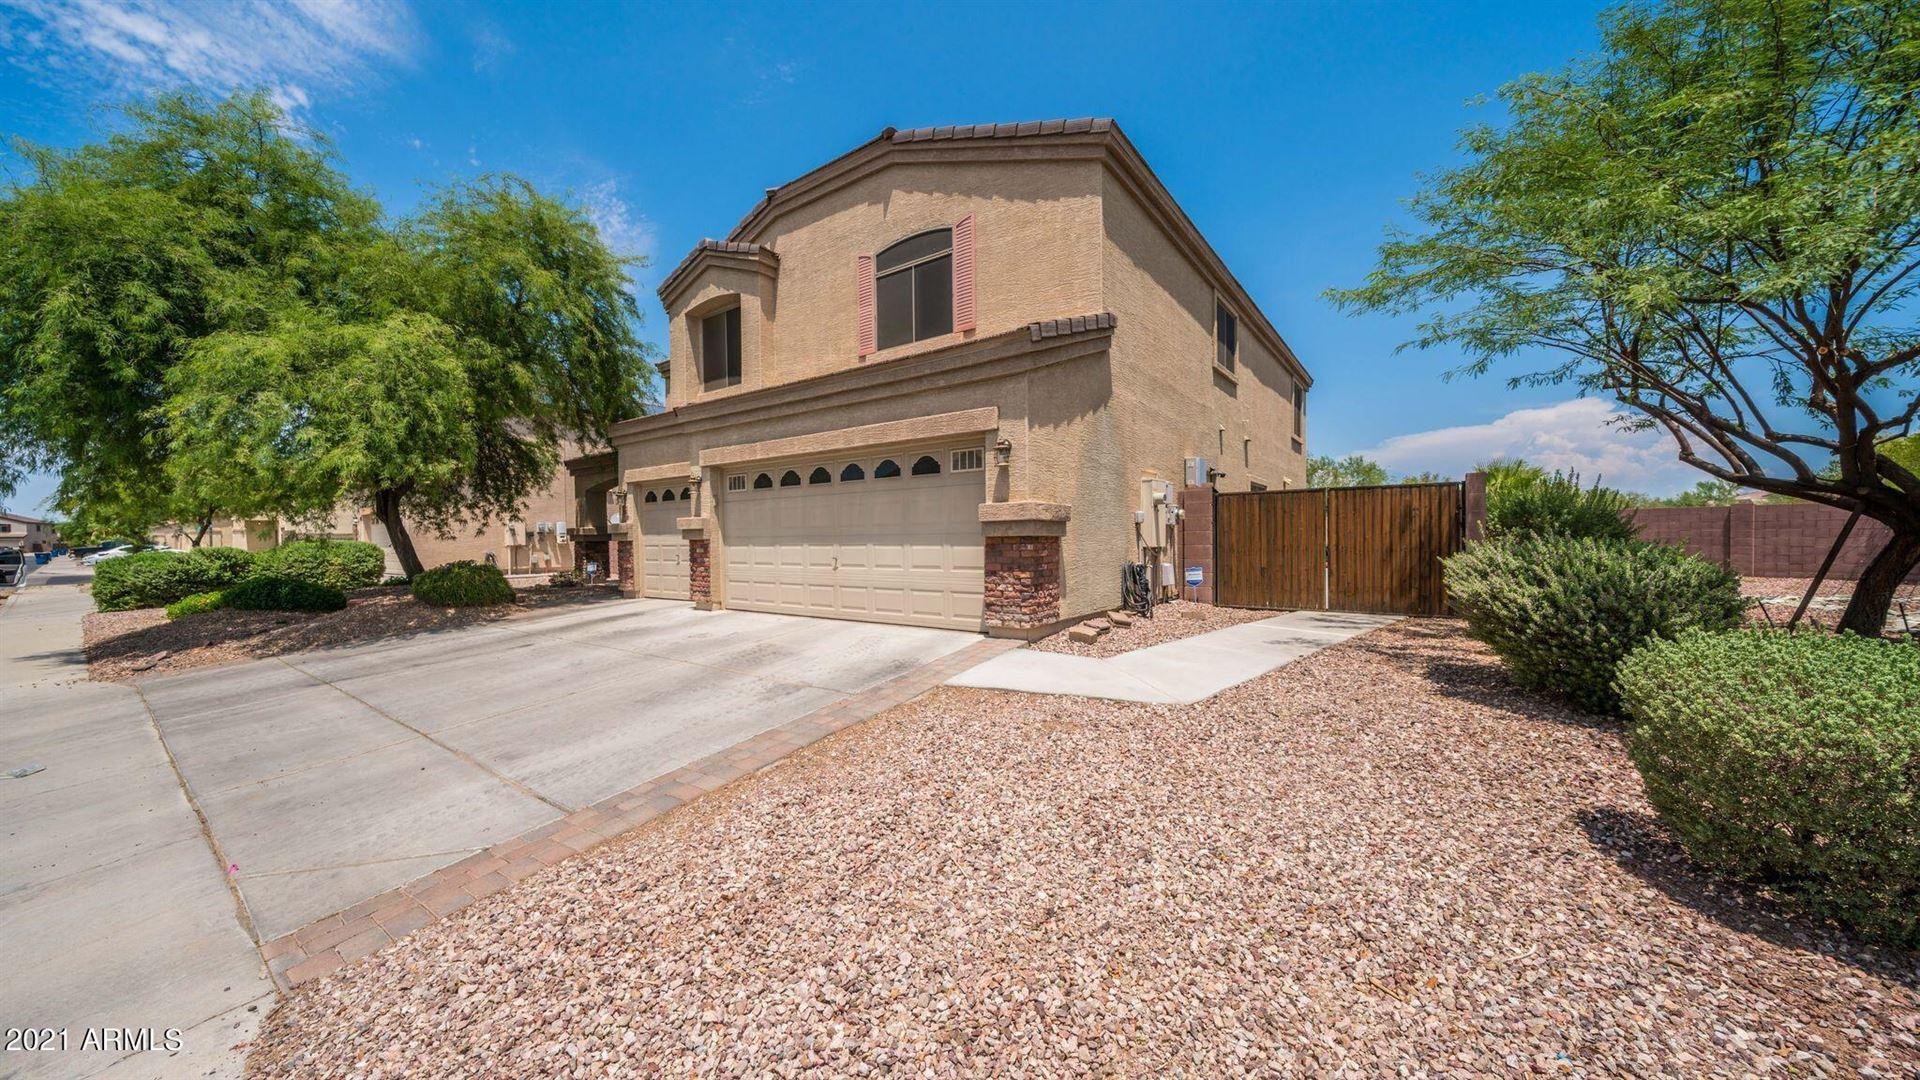 Photo of 21946 W KIMBERLY Drive, Buckeye, AZ 85326 (MLS # 6268646)